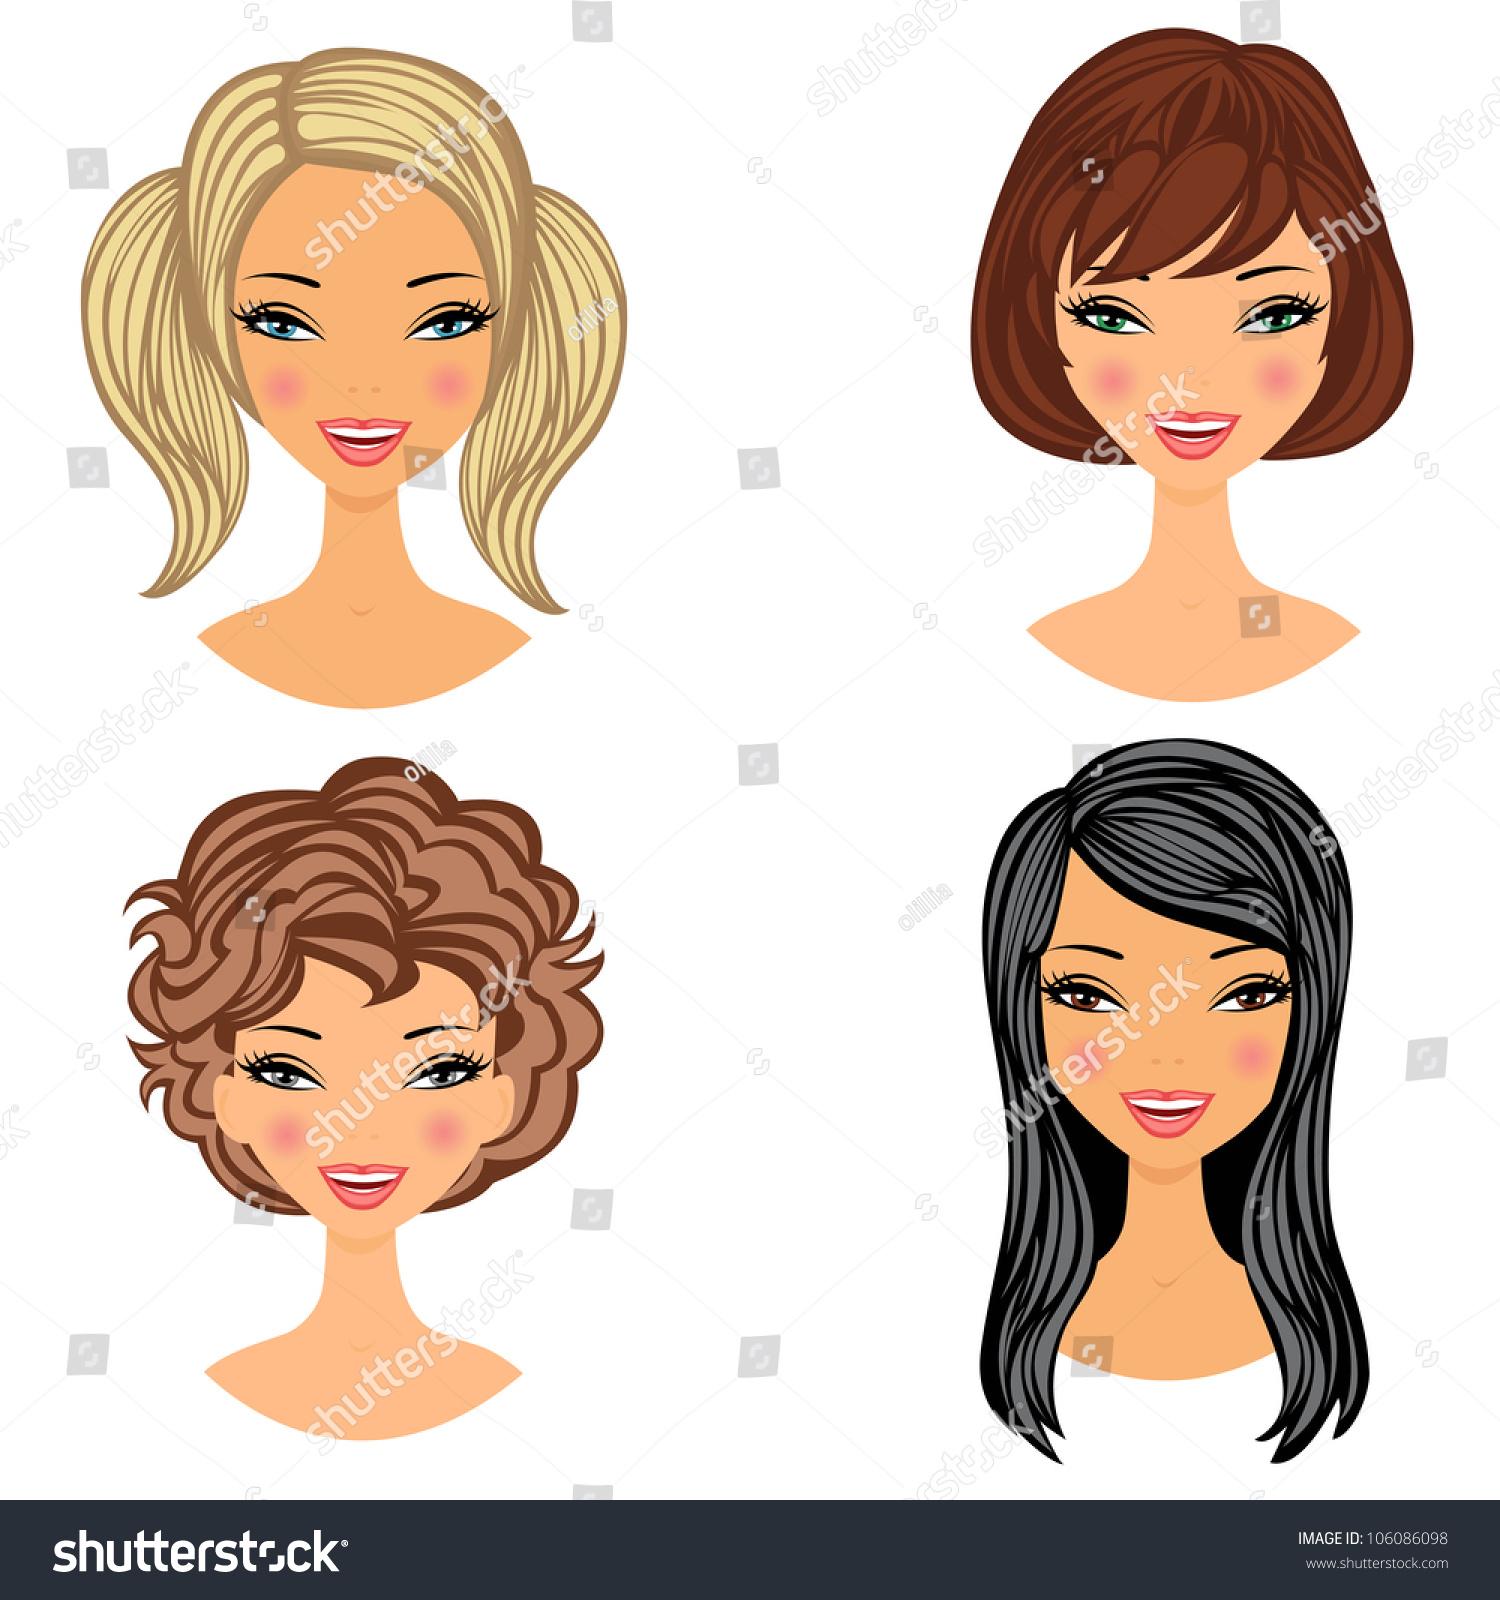 beautiful girls faces set stock vector 106086098 shutterstock